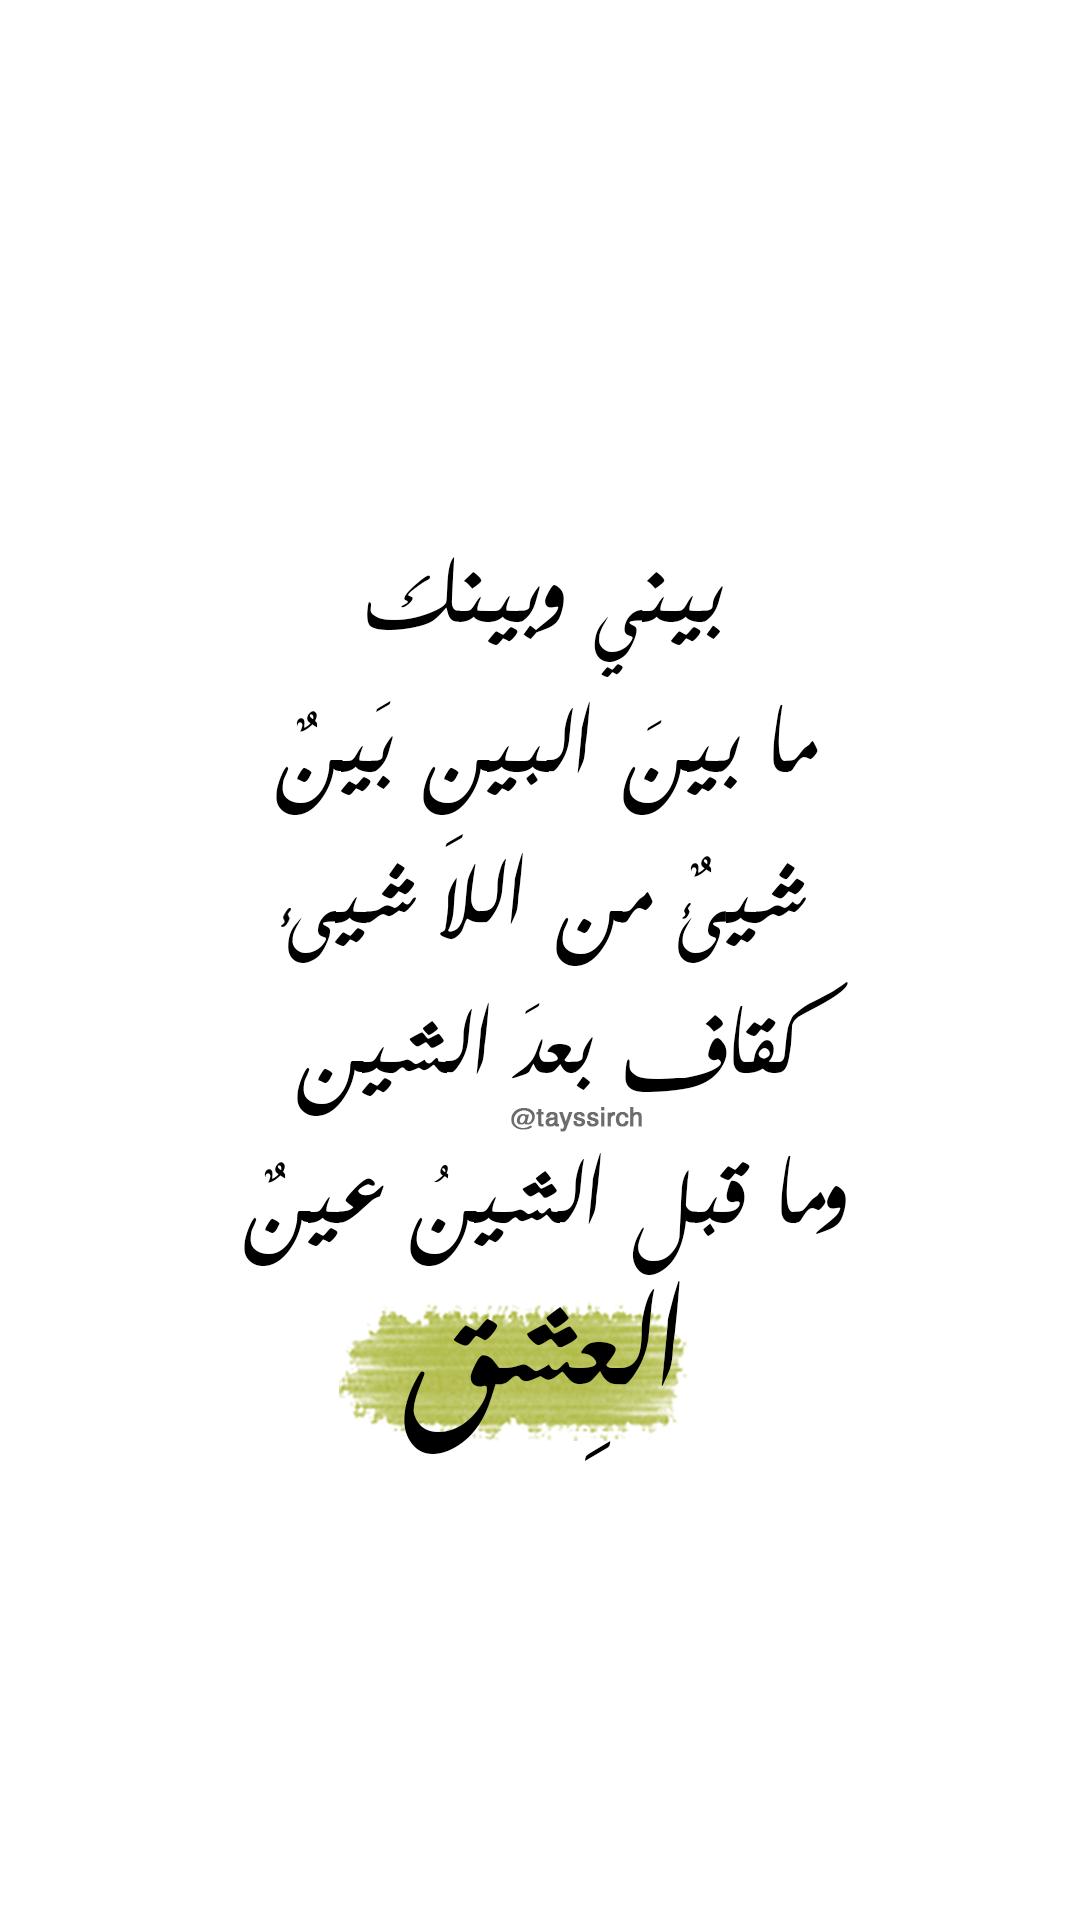 بيني وبينك العشق Wise Words Quotes Funny Arabic Quotes Friends Quotes